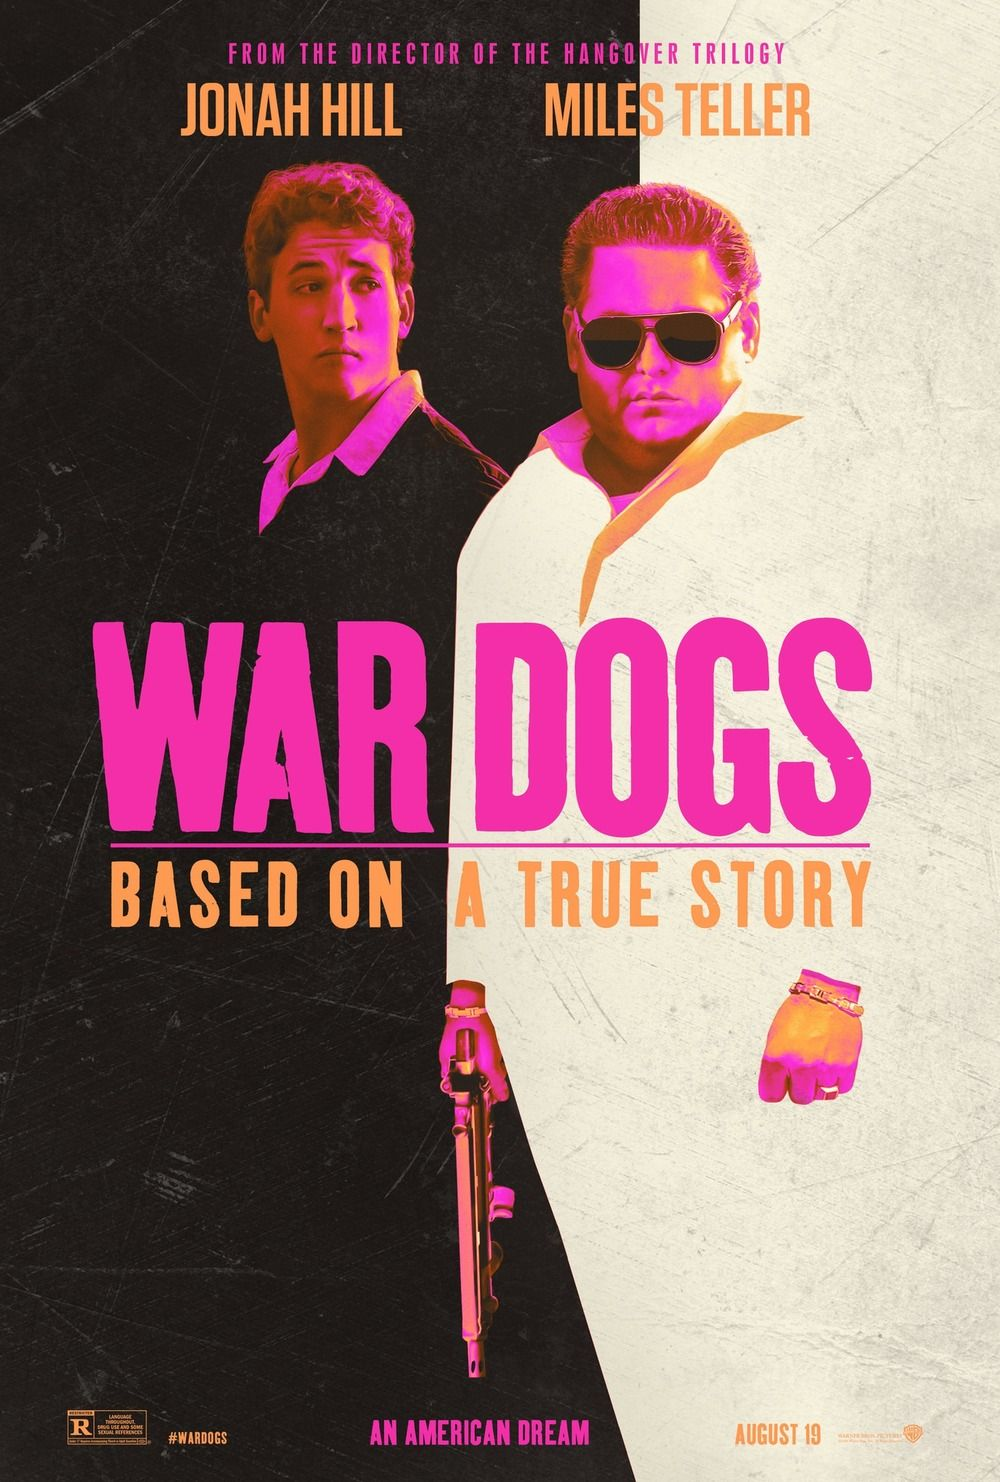 War Dogs War dogs, Miles teller, Free movies online